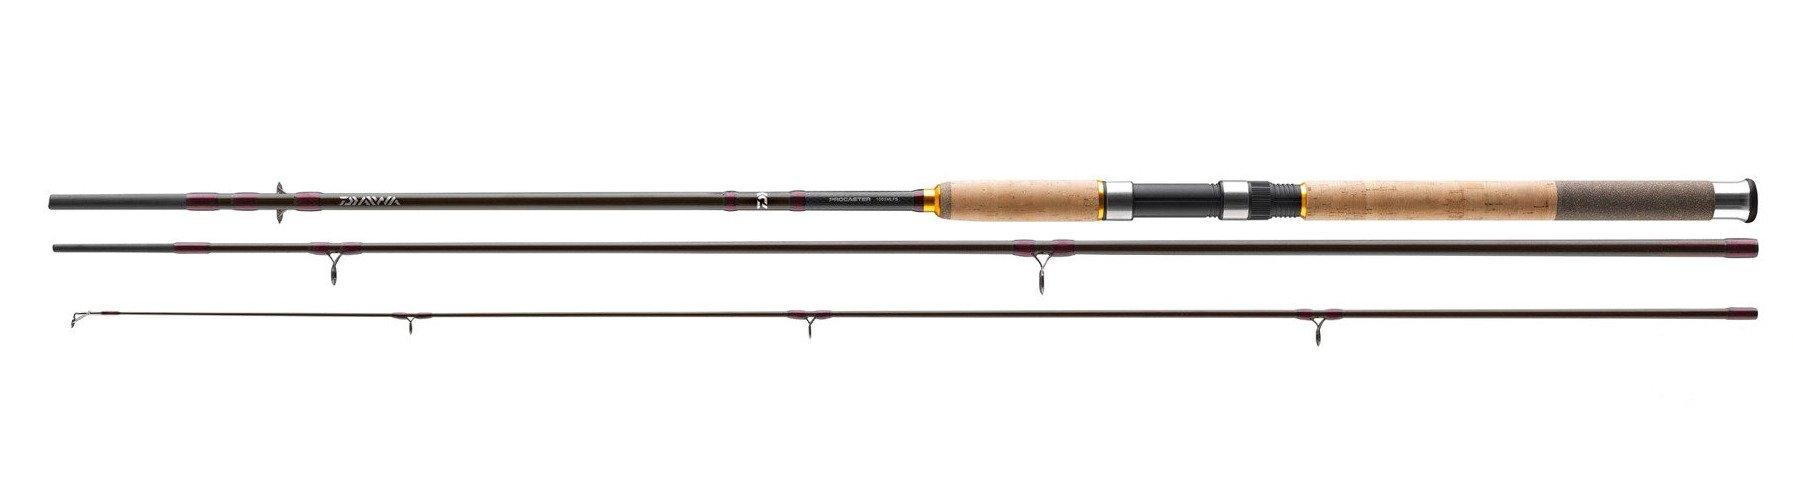 Daiwa Procaster Trout  390cm 10-25g